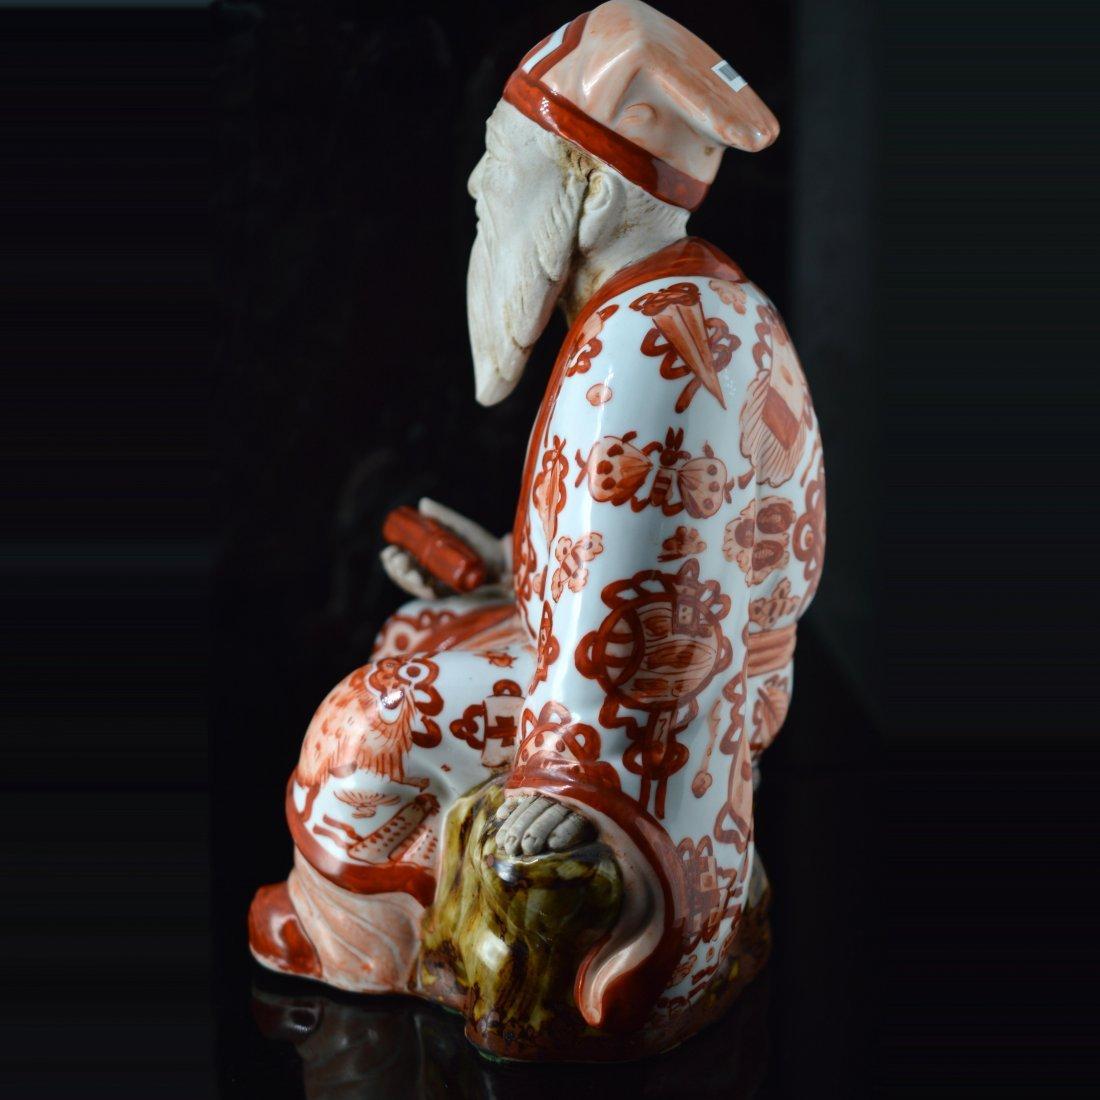 Red Glazed Japanese Porcelain Figure Ornament - 4